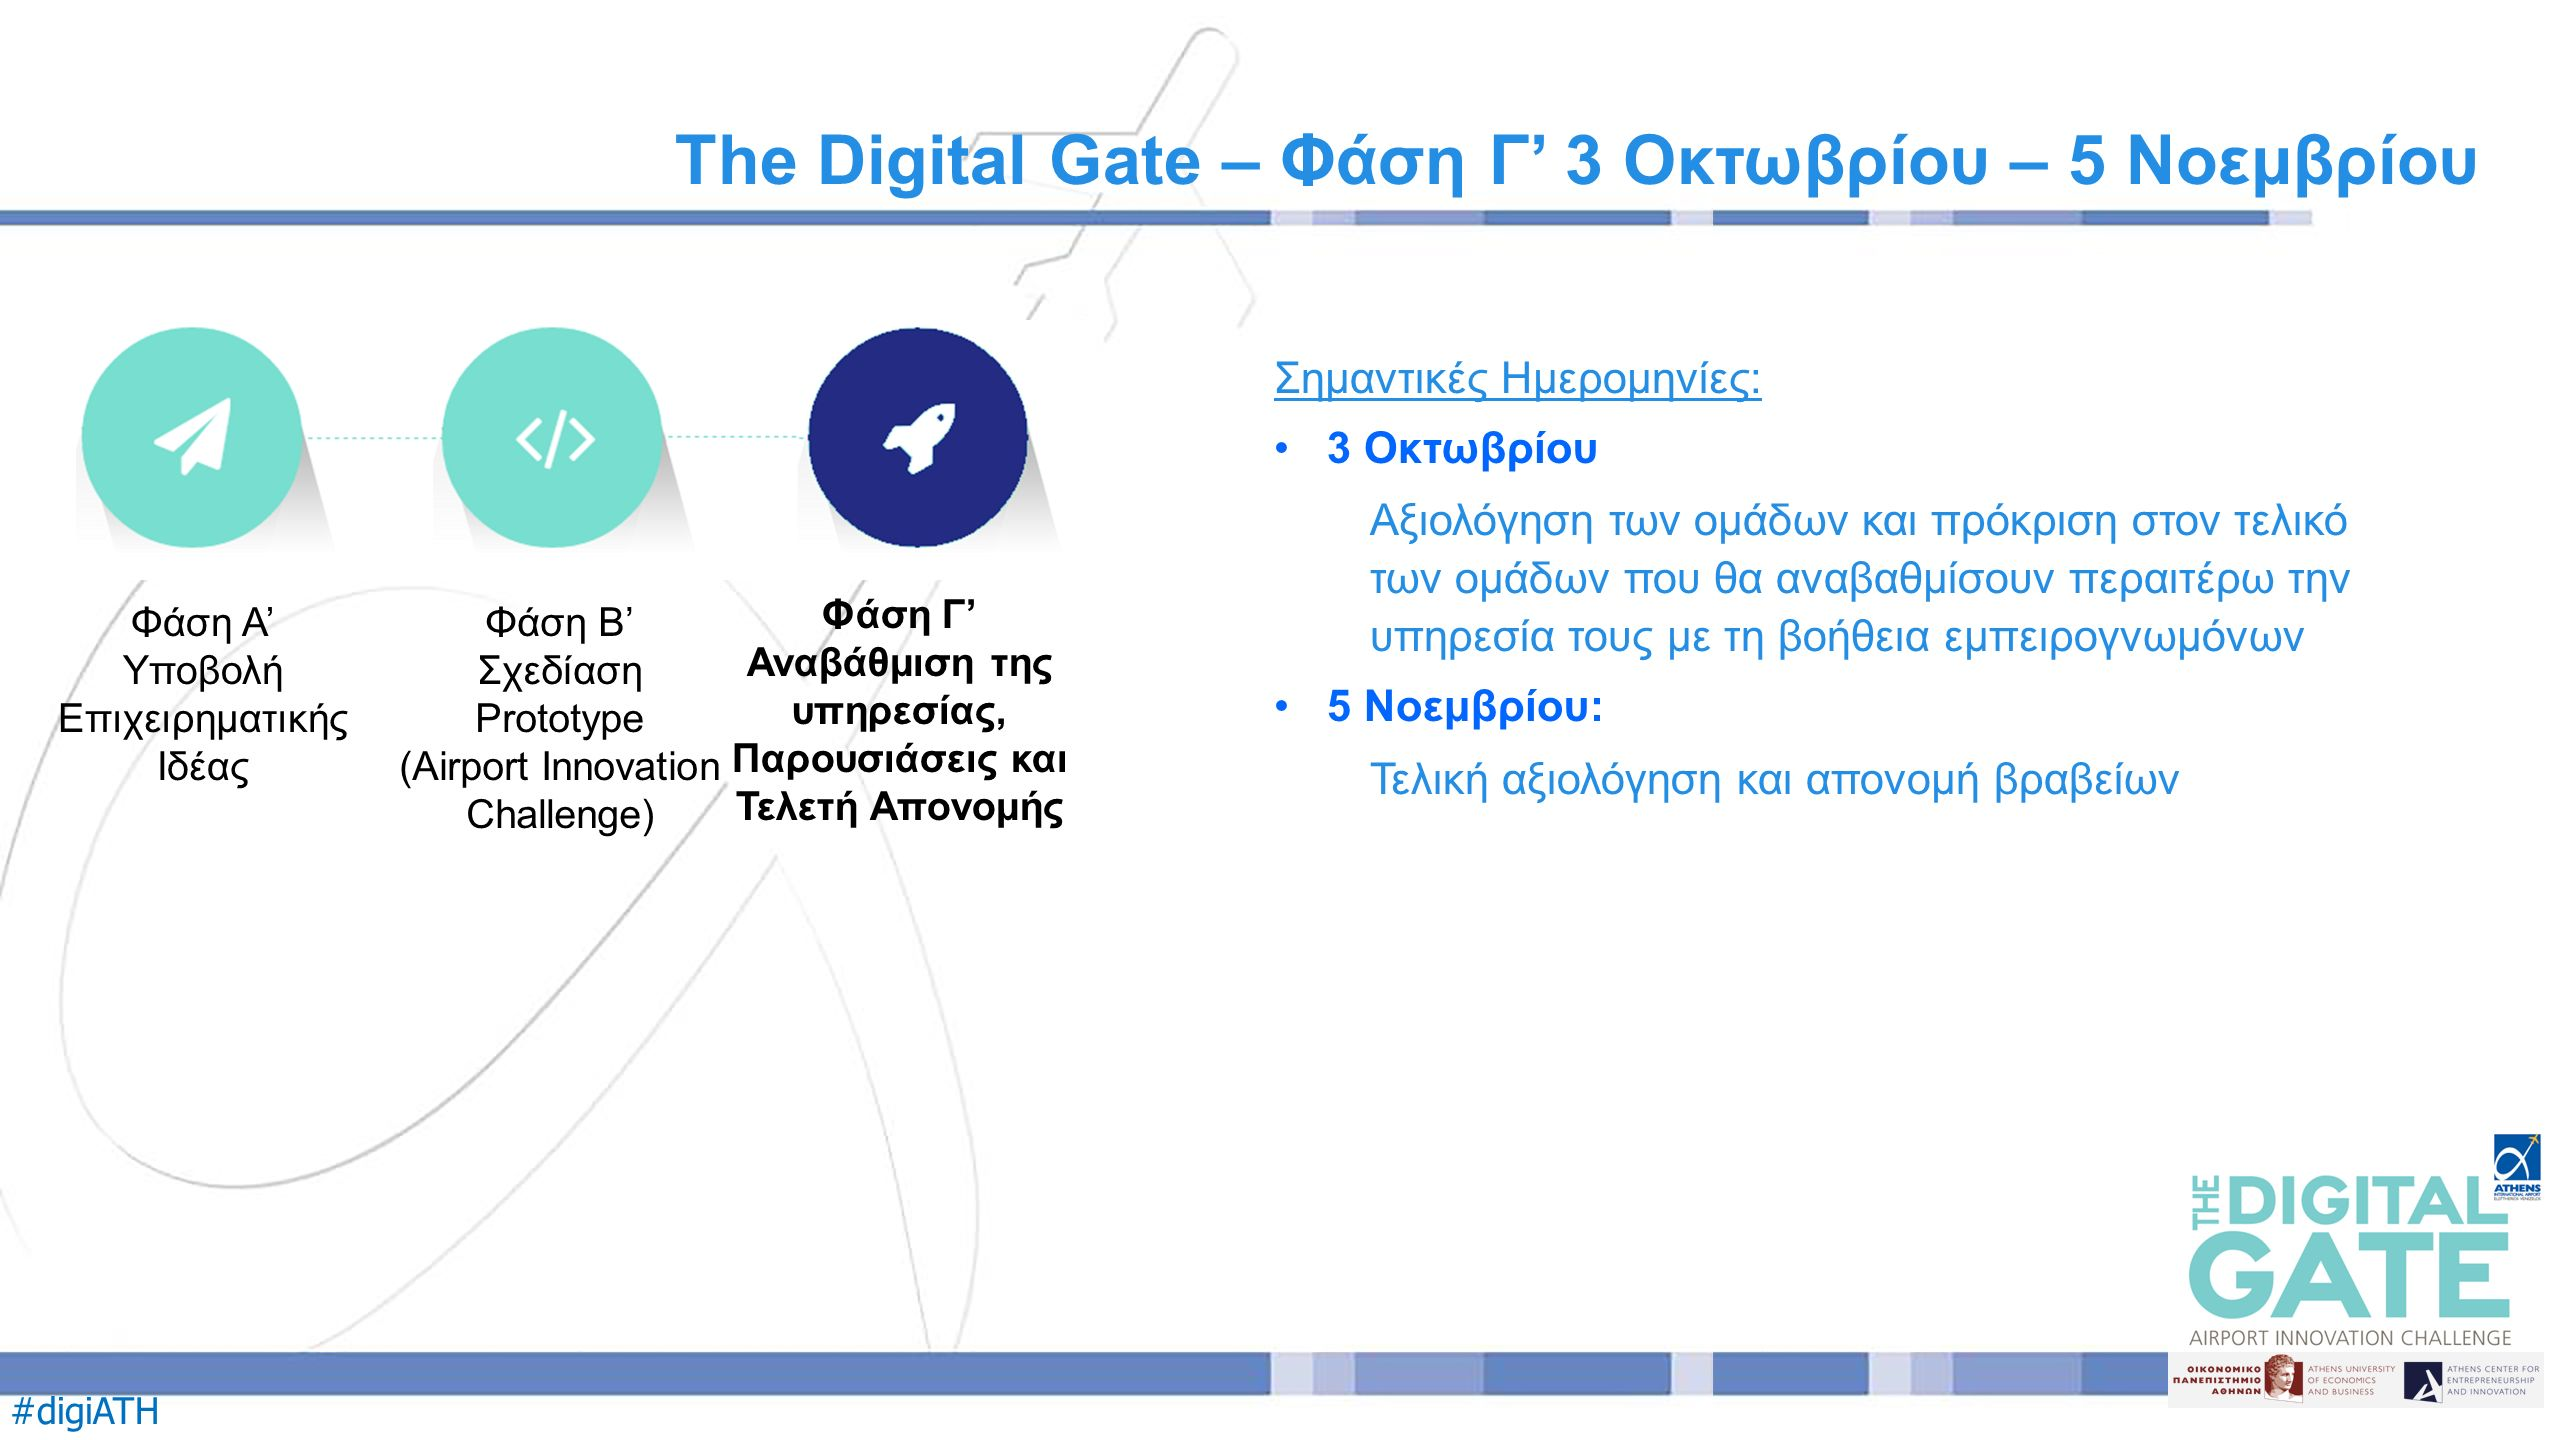 #digiATH Σημαντικές Ημερομηνίες: 3 Οκτωβρίου Αξιολόγηση των ομάδων και πρόκριση στον τελικό των ομάδων που θα αναβαθμίσουν περαιτέρω την υπηρεσία τους με τη βοήθεια εμπειρογνωμόνων 5 Νοεμβρίου: Τελική αξιολόγηση και απονομή βραβείων The Digital Gate – Φάση Γ' 3 Οκτωβρίου – 5 Νοεμβρίου Φάση Α' Υποβολή Επιχειρηματικής Ιδέας Φάση Β' Σχεδίαση Prototype (Airport Innovation Challenge) Φάση Γ' Αναβάθμιση της υπηρεσίας, Παρουσιάσεις και Τελετή Απονομής